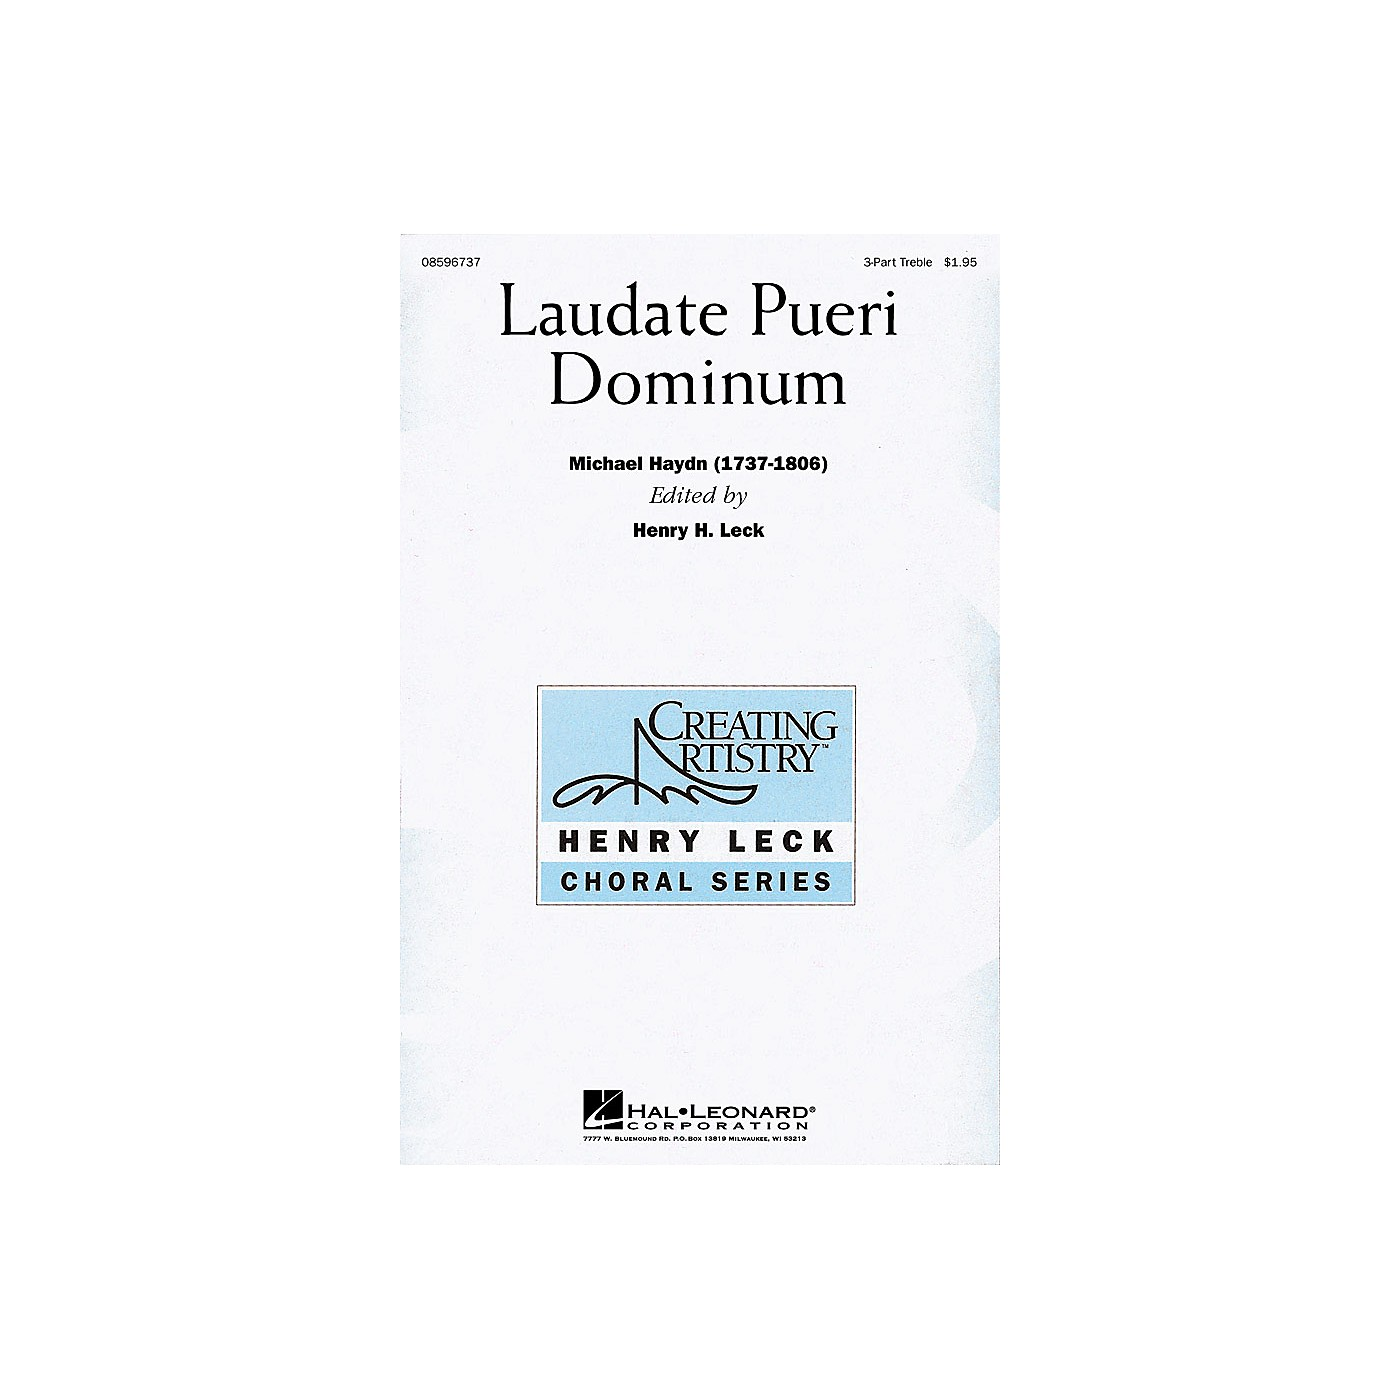 Hal Leonard Laudate Pueri Dominum (Lord, Now We Praise Your Name) (SSA) 3 Part Treble arranged by Henry Leck thumbnail